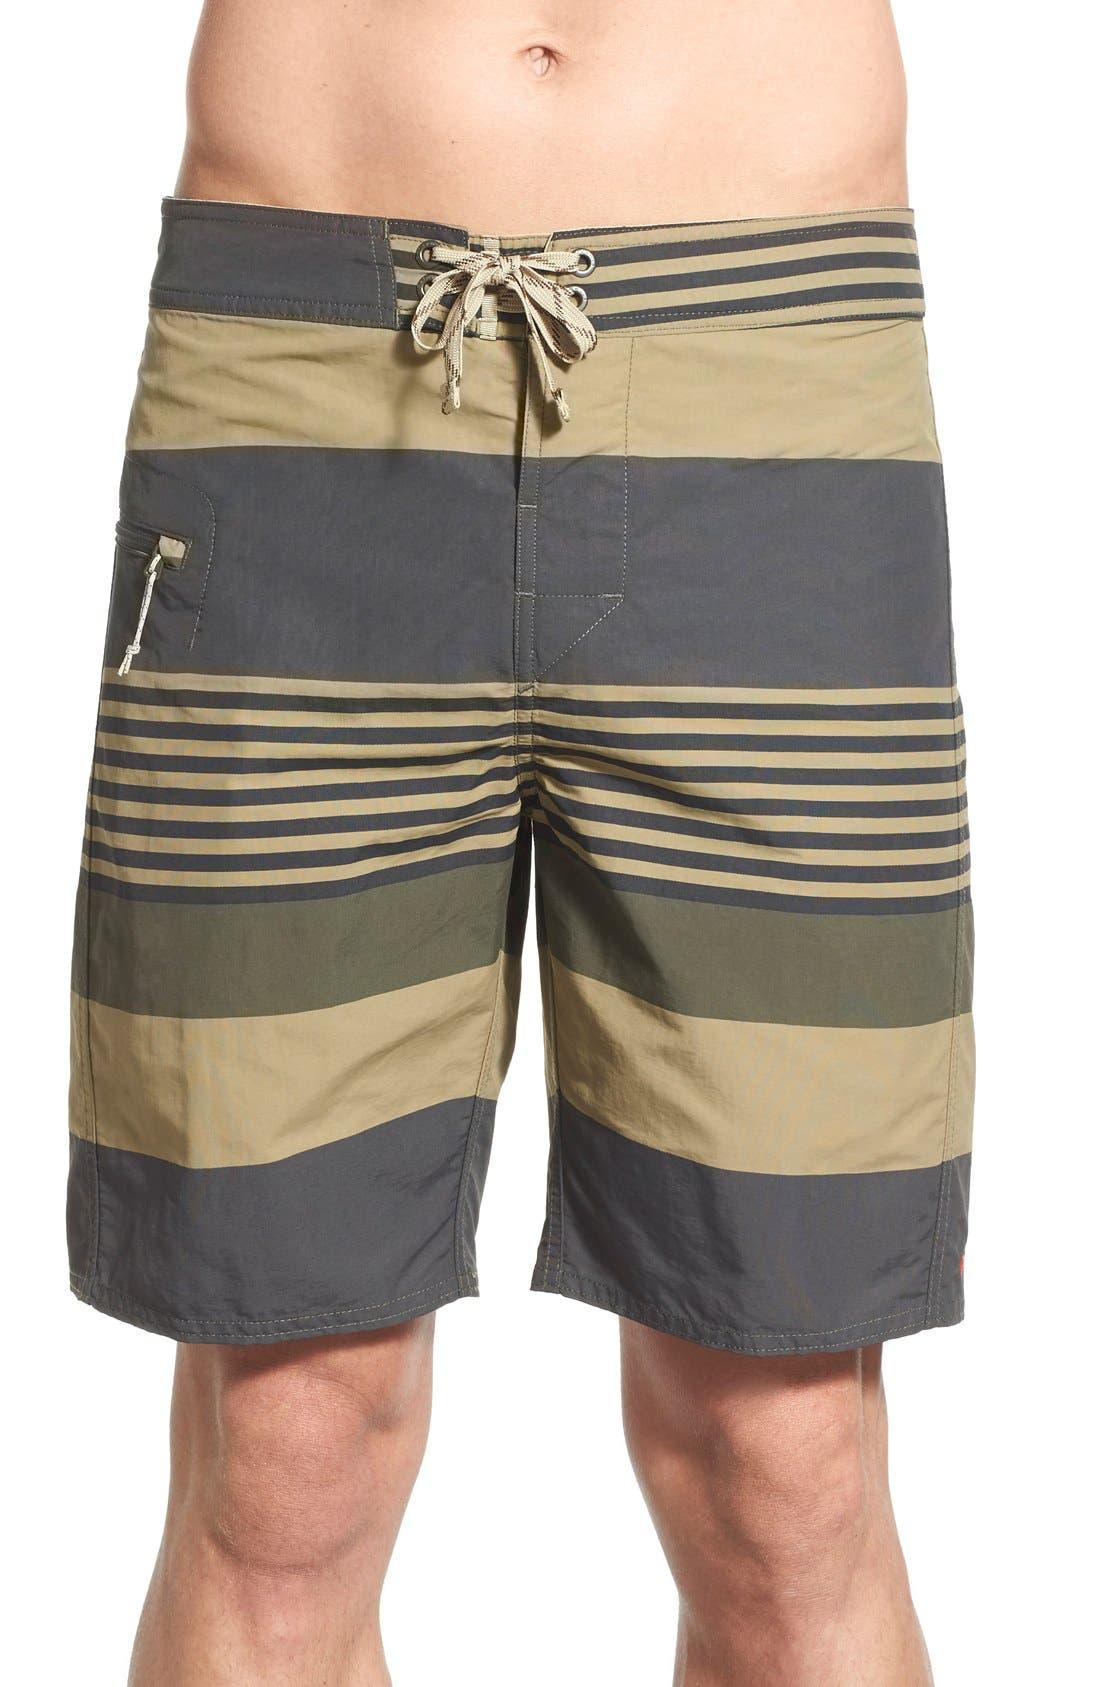 Patagonia Wavefarer Board Shorts